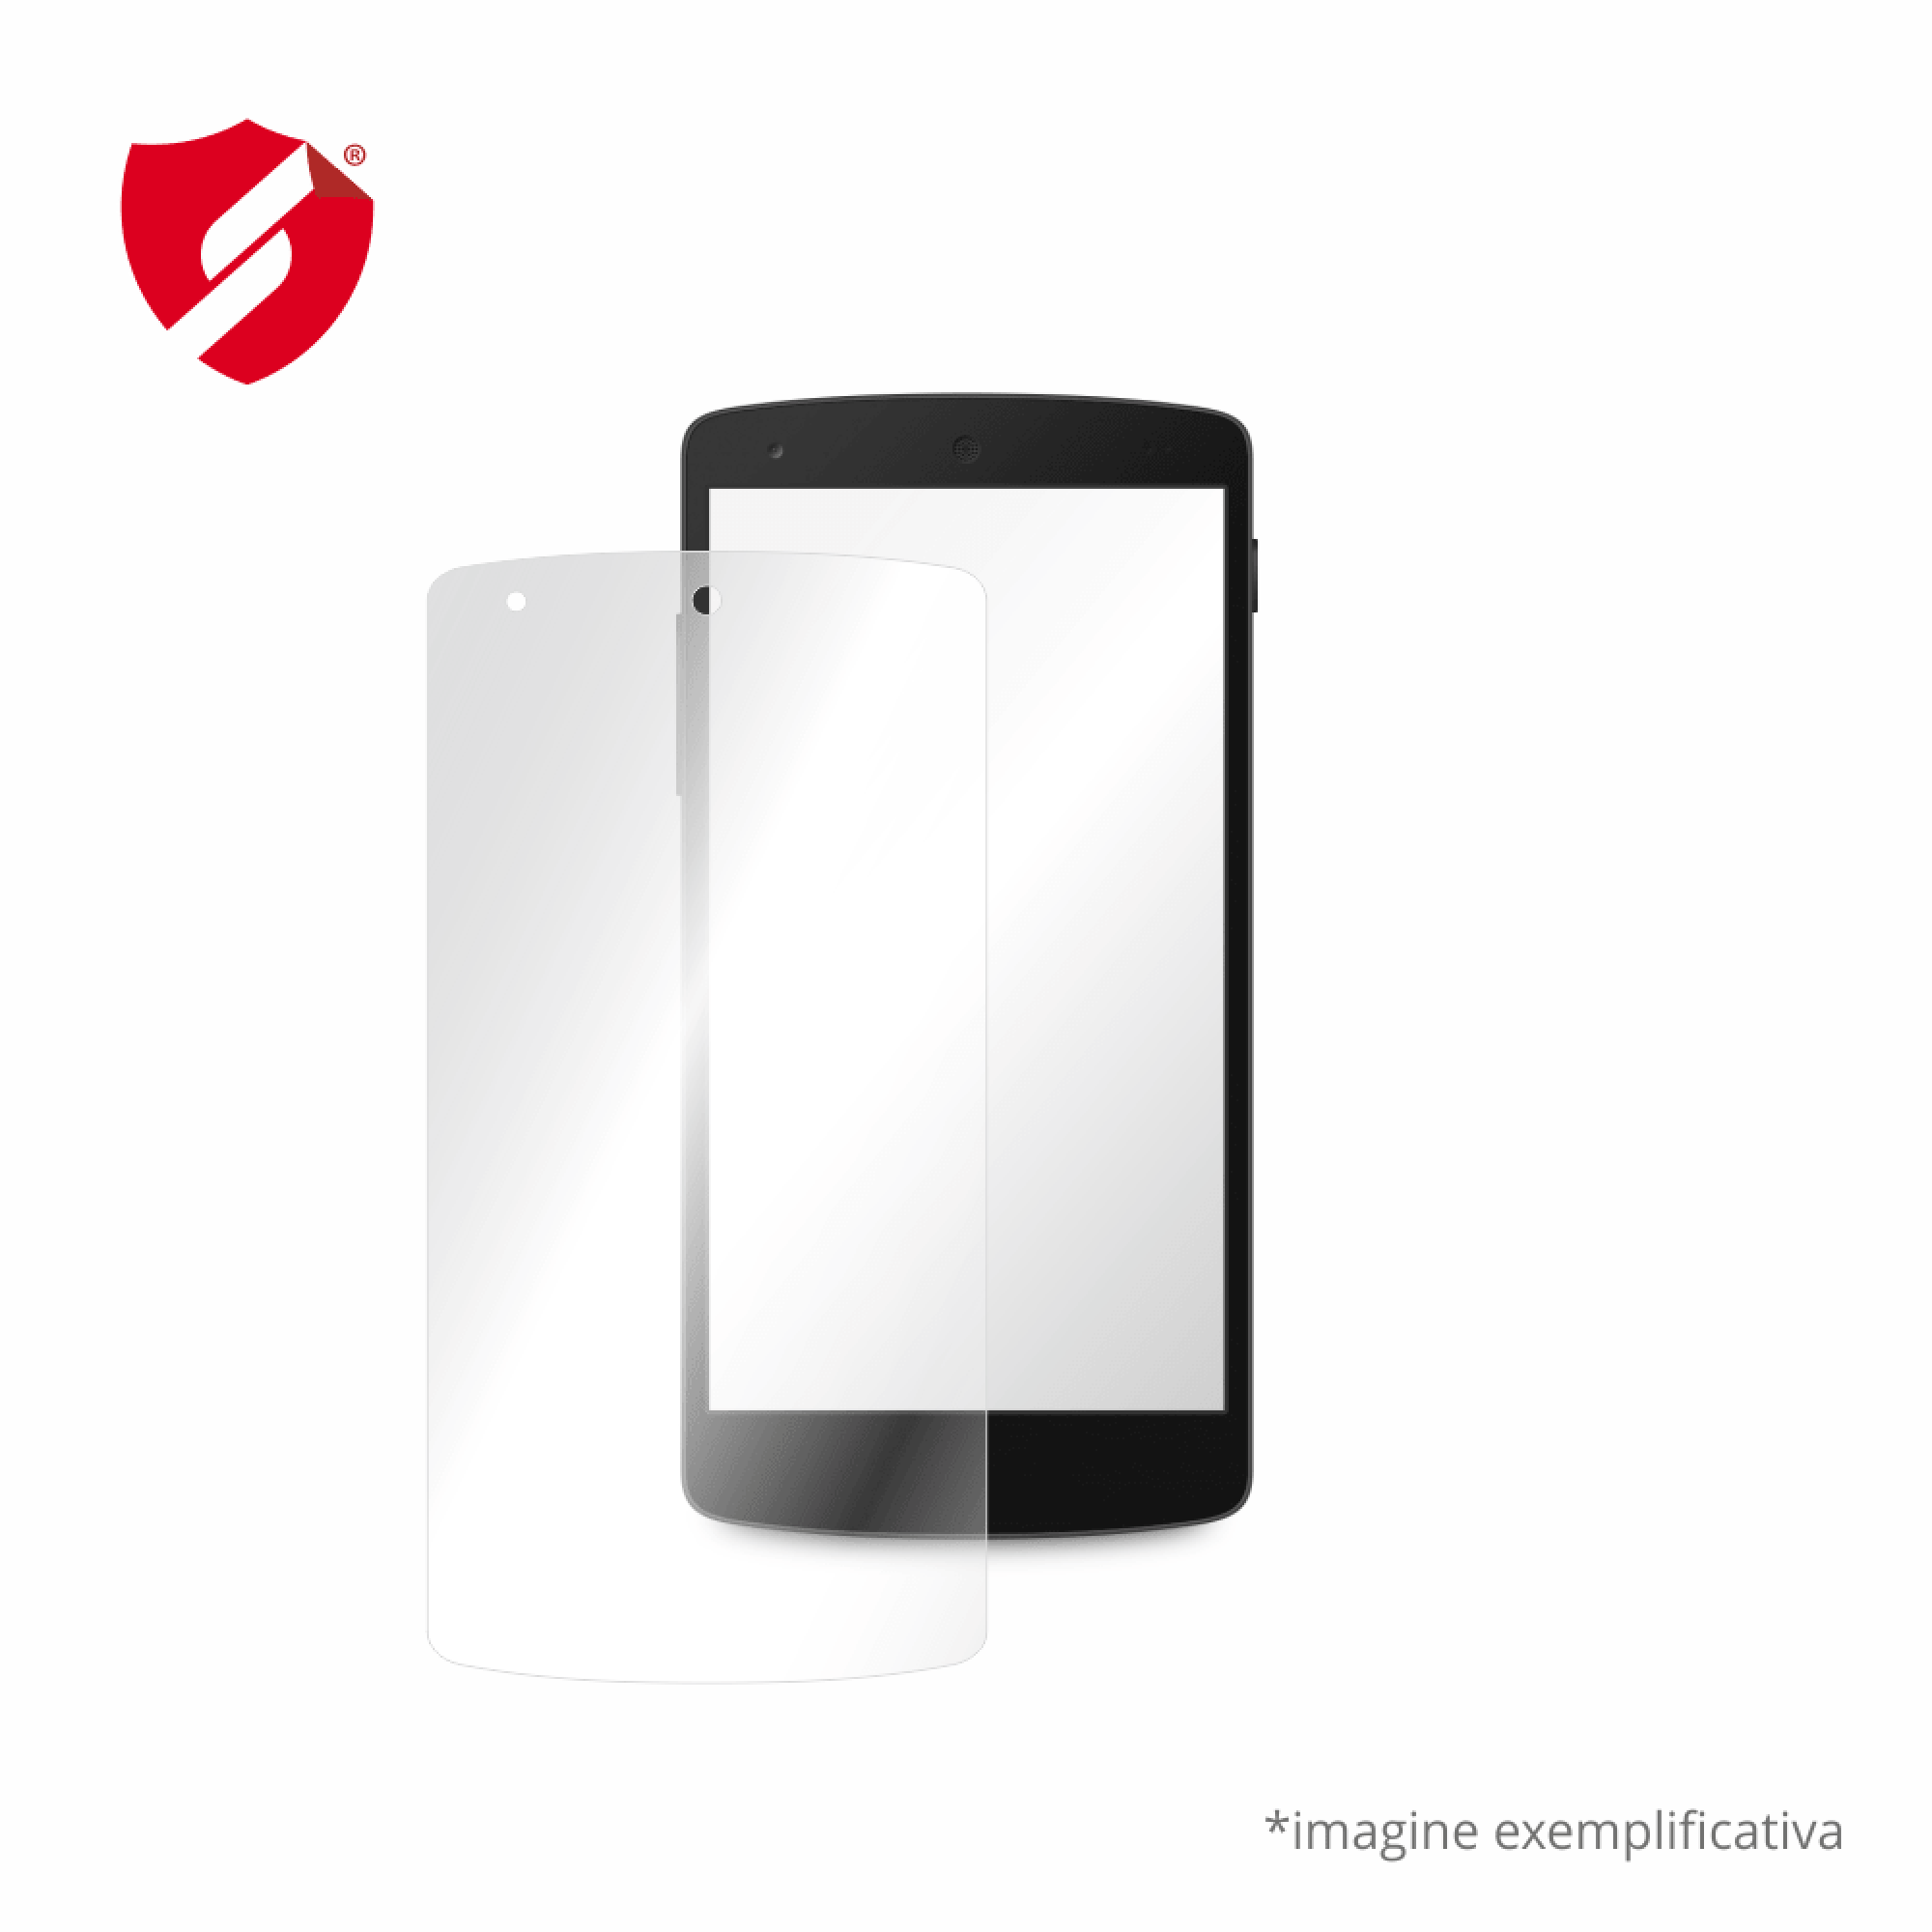 Folie de protectie Smart Protection Energizer HARDCASE Energy 100 - 2buc x folie display imagine